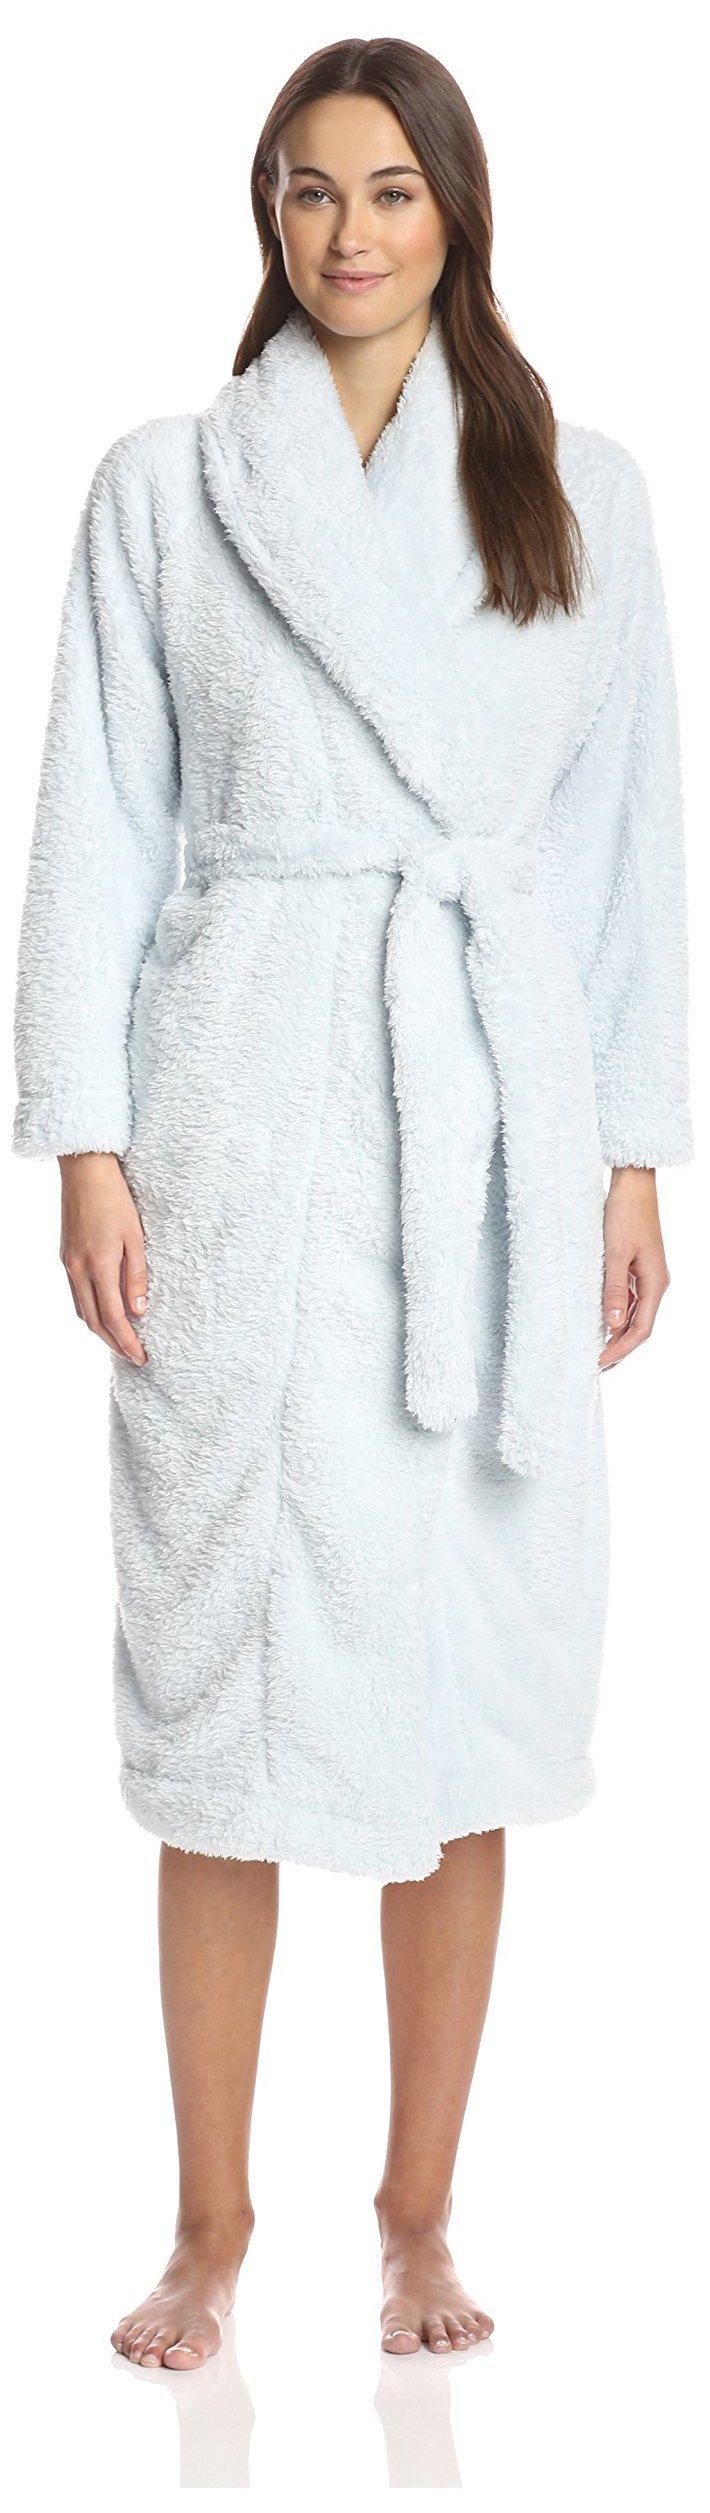 Skin Women's Plush Robe, Artic Blue, M (2)